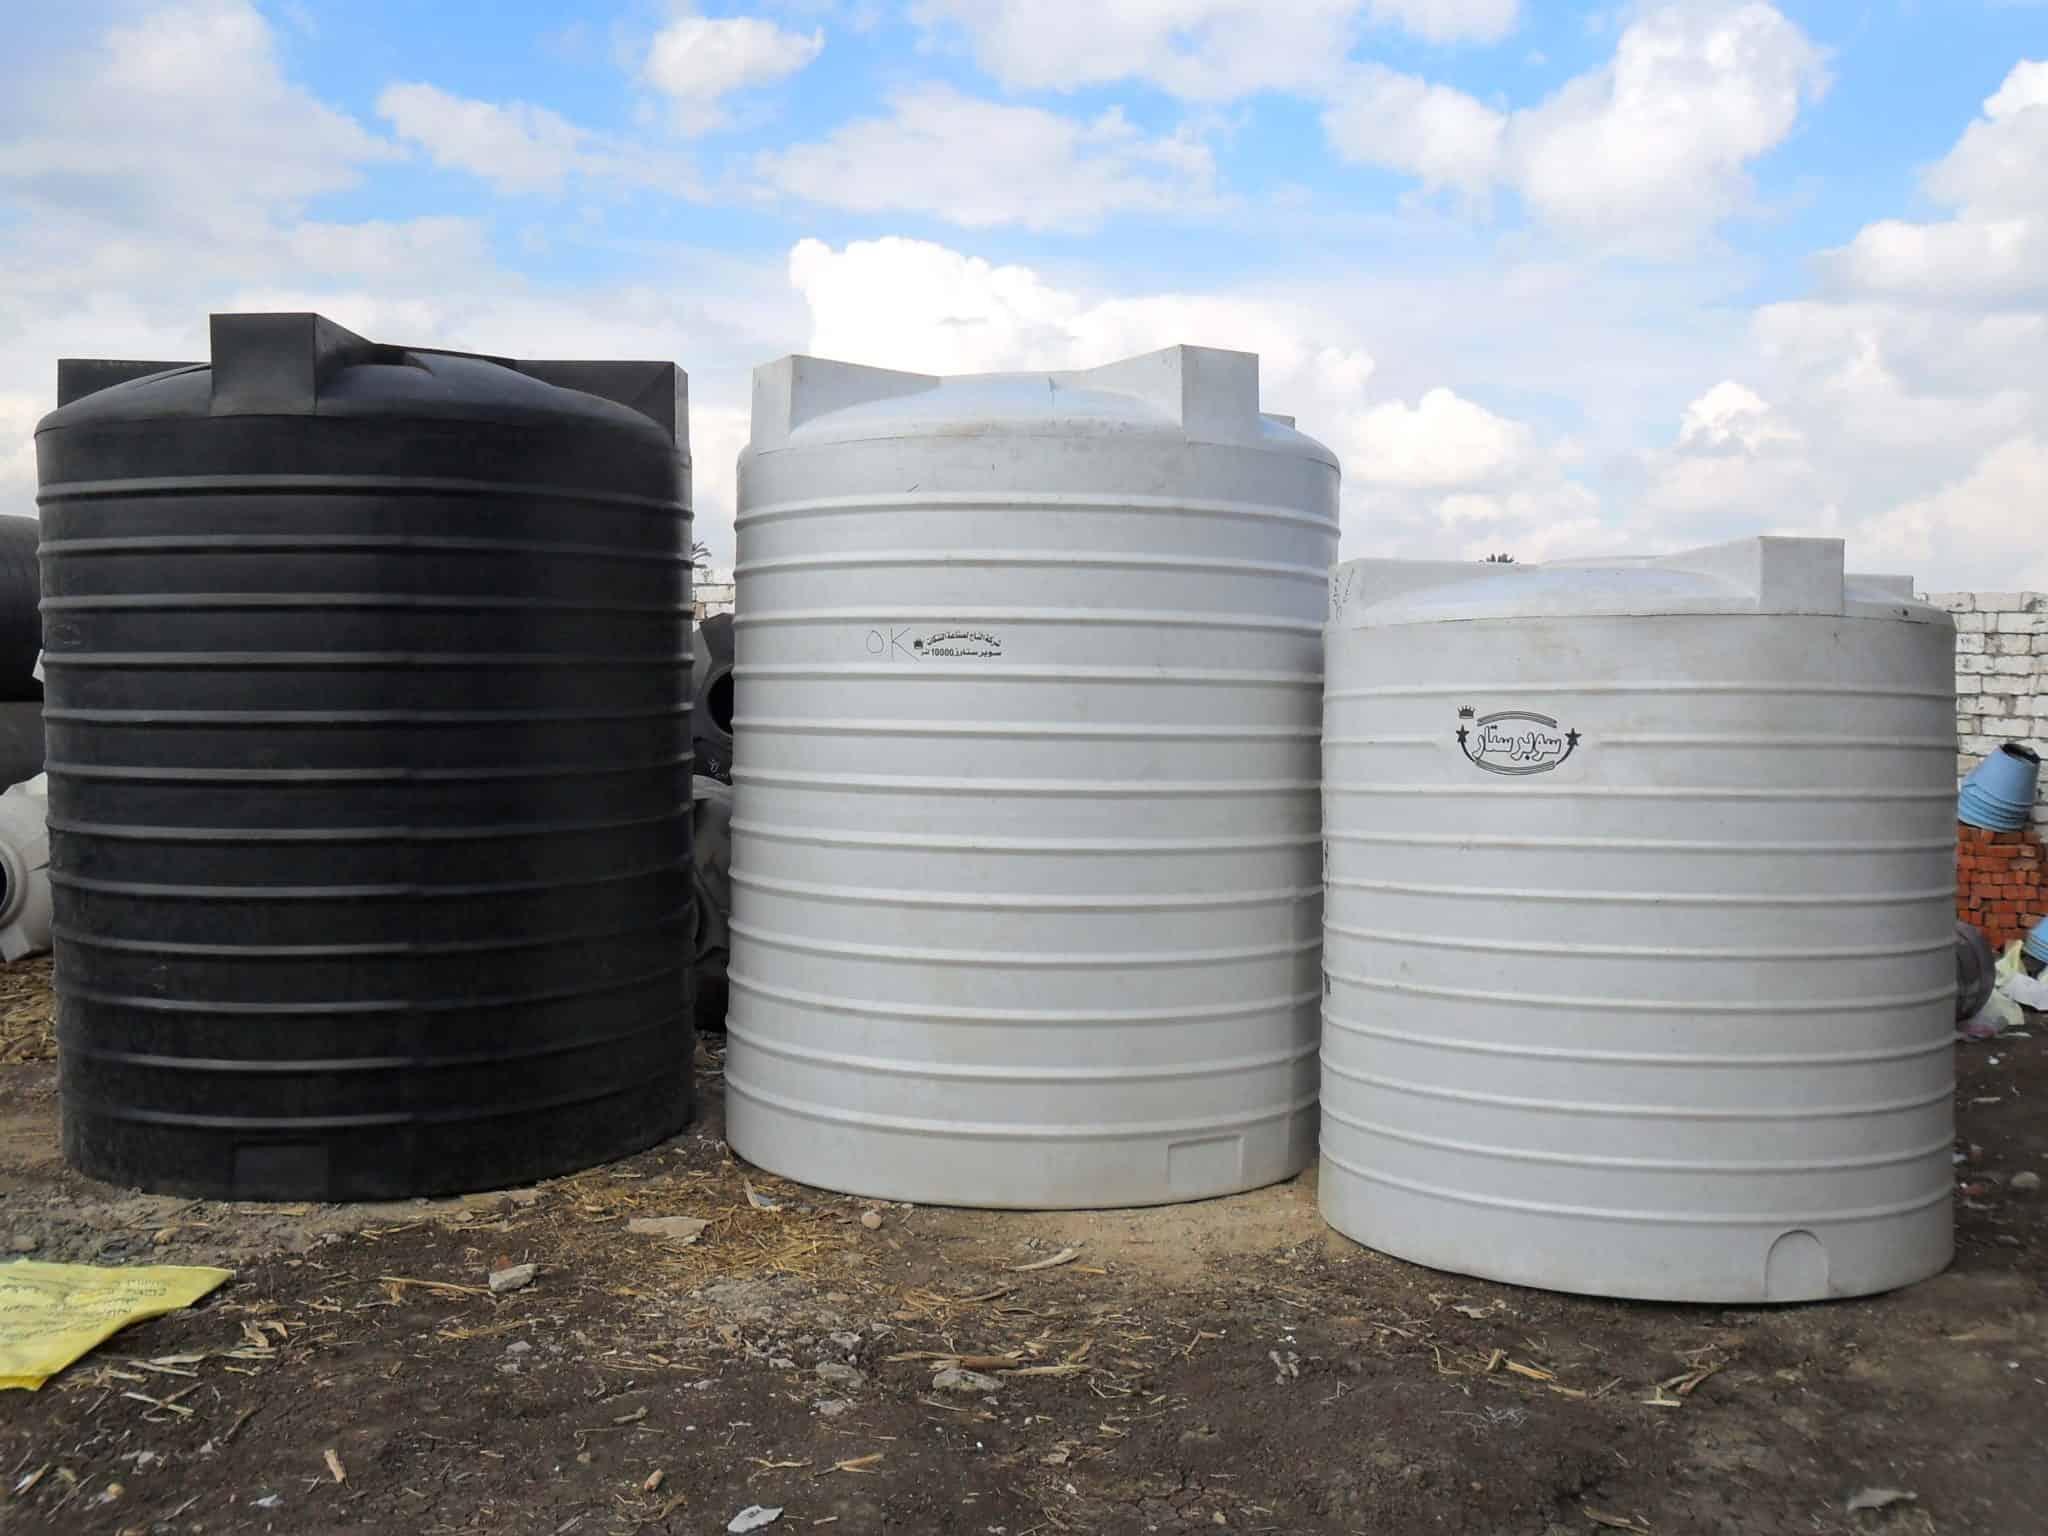 خزانات مياه الشرب - غسيل خزانات مياه الشرب مع التعقيم والتطهير